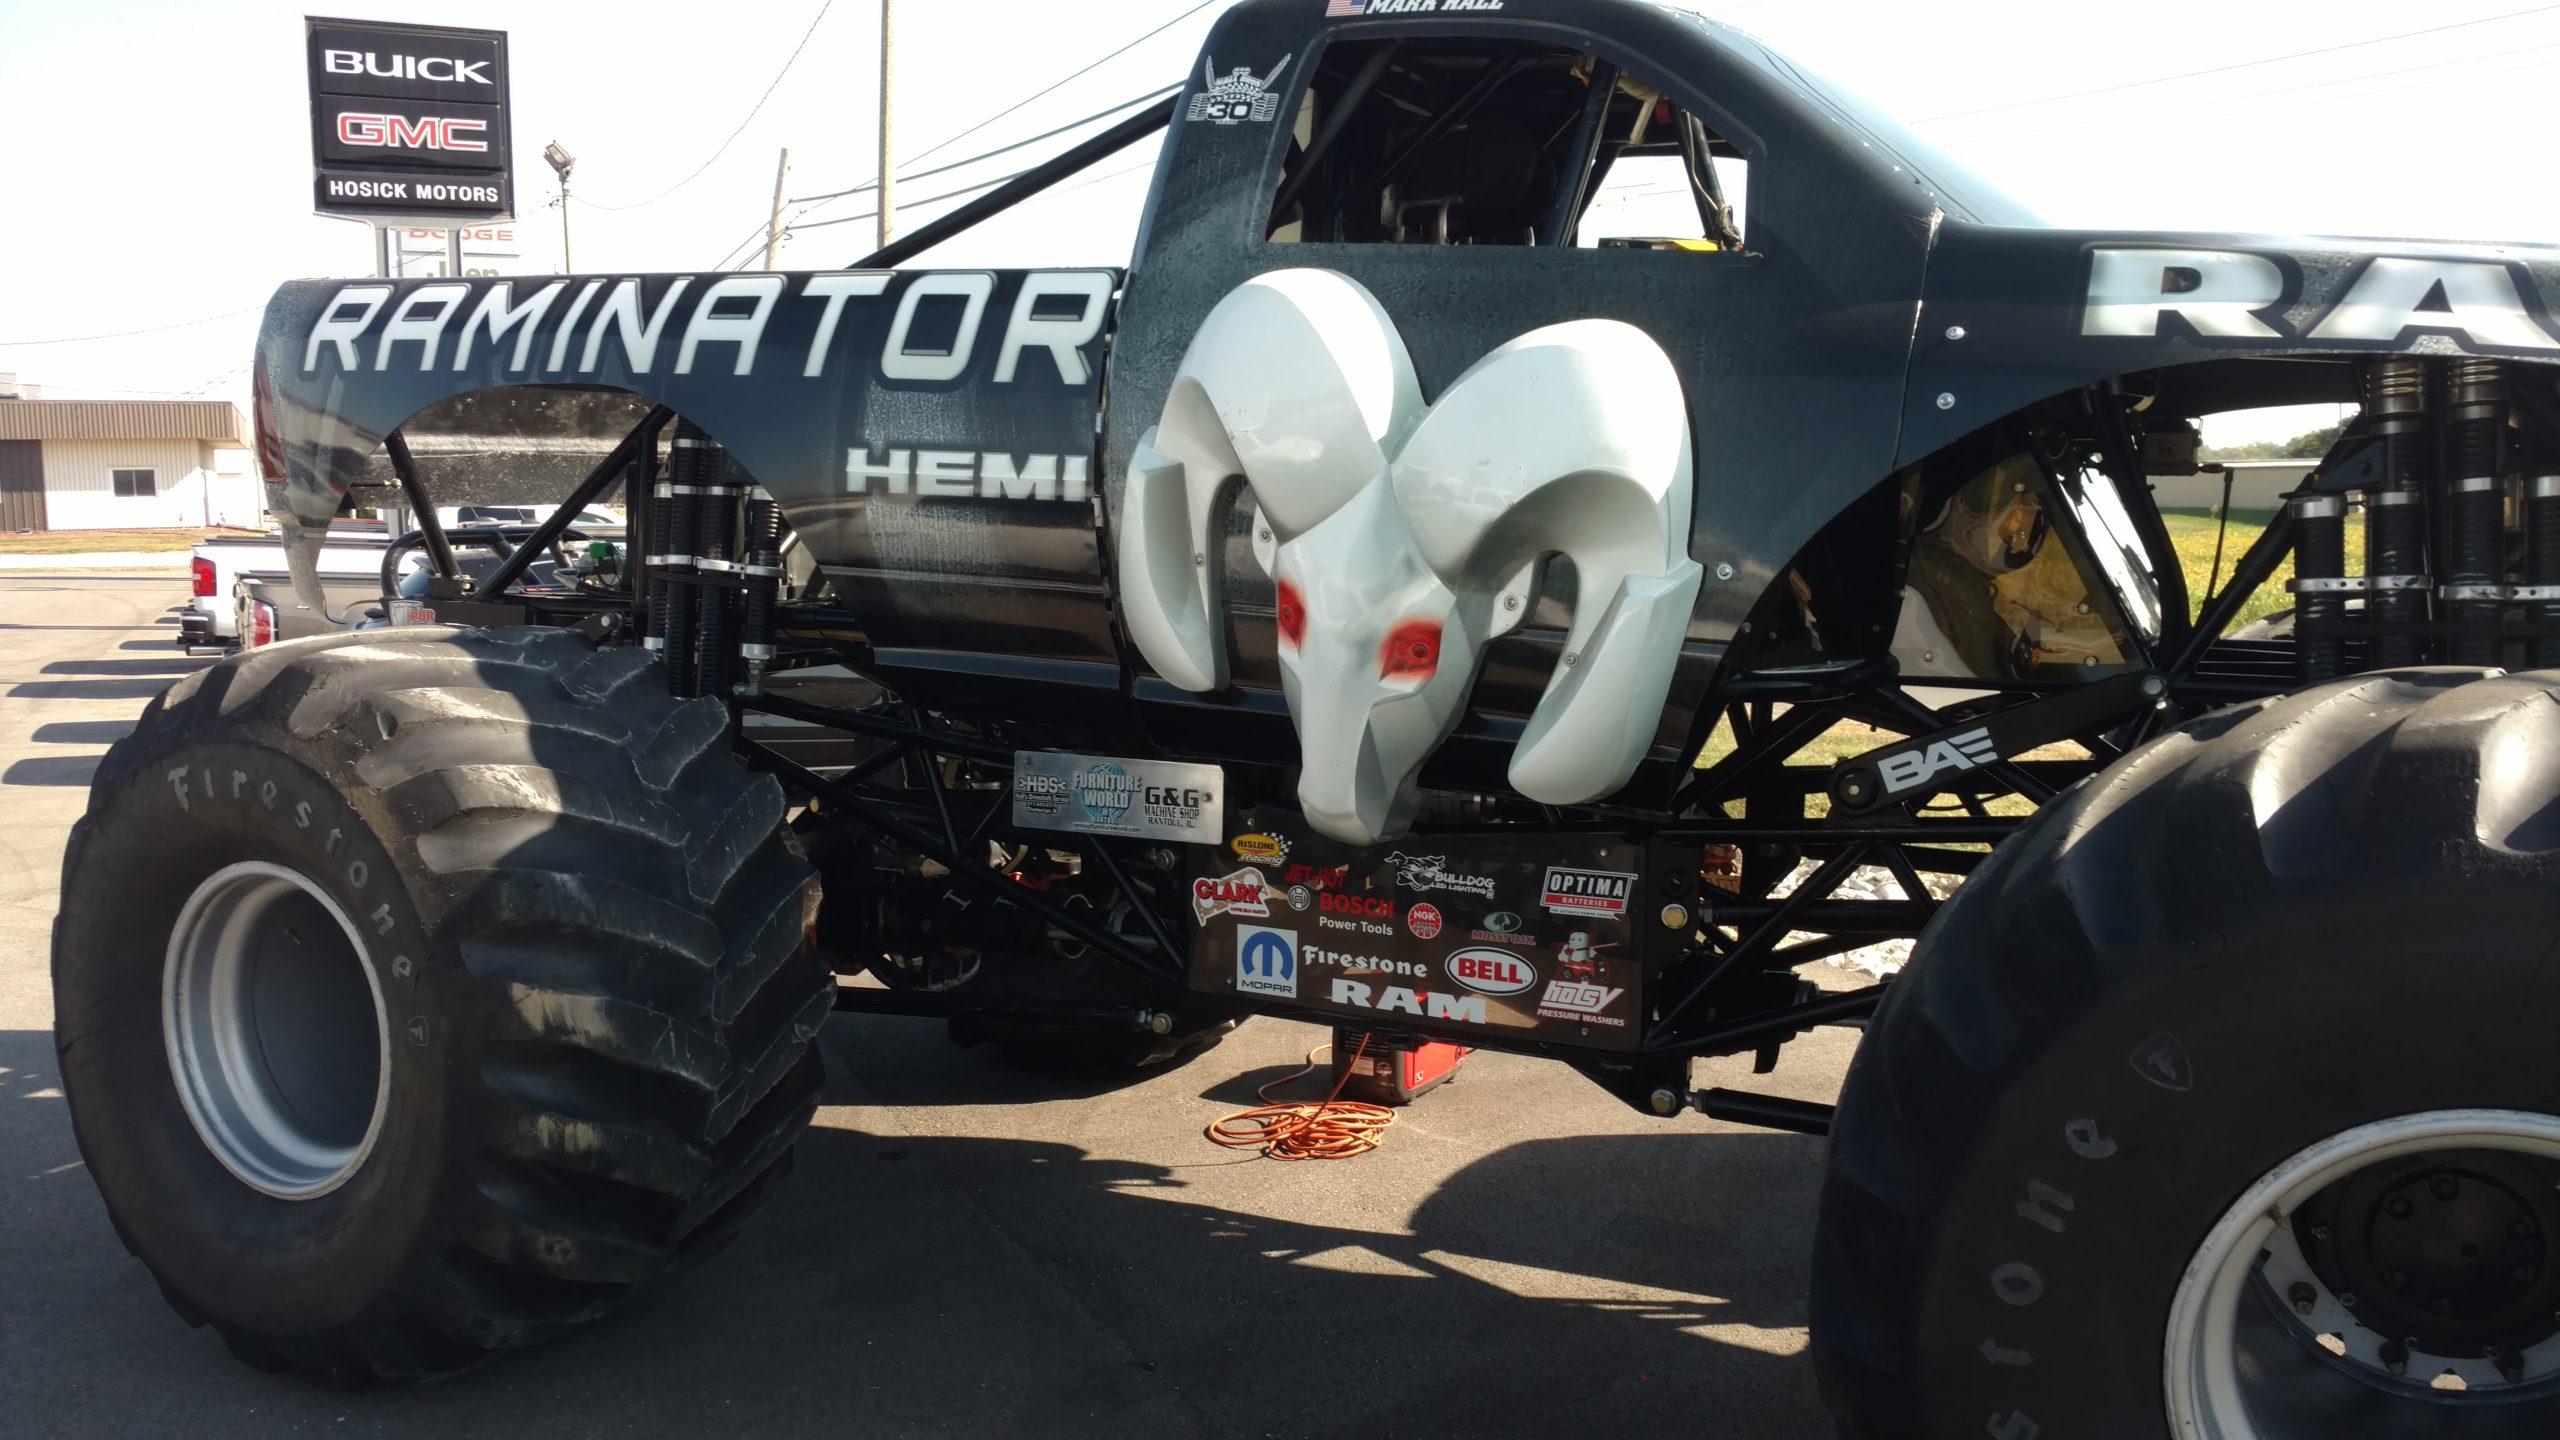 Raminator at Hosick Motors Today